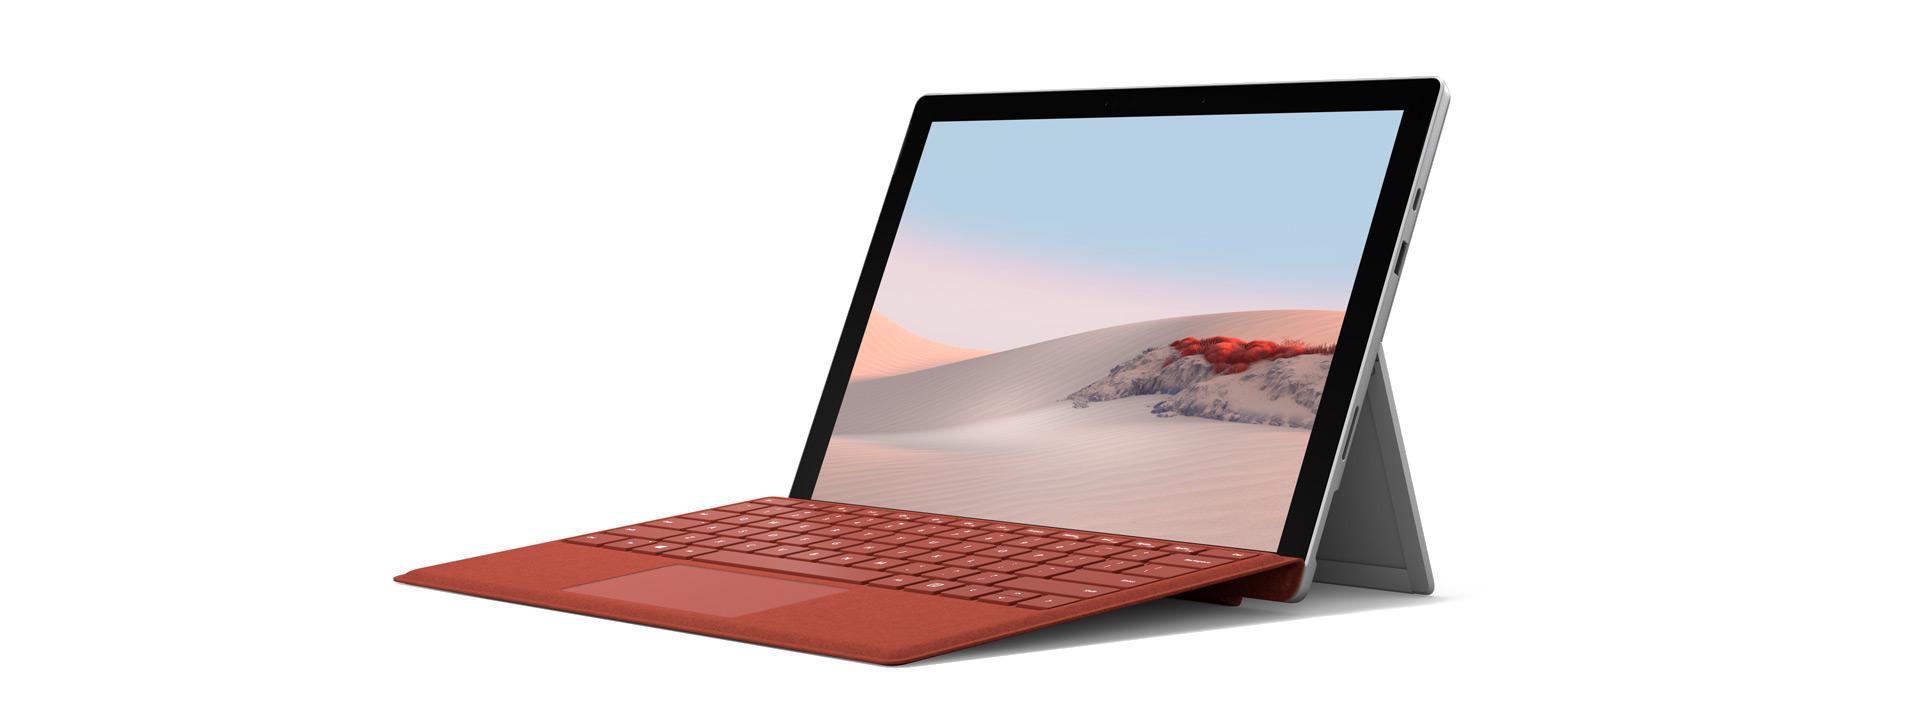 Surface 专业键盘盖打开一定角度的 Surafce Pro 7